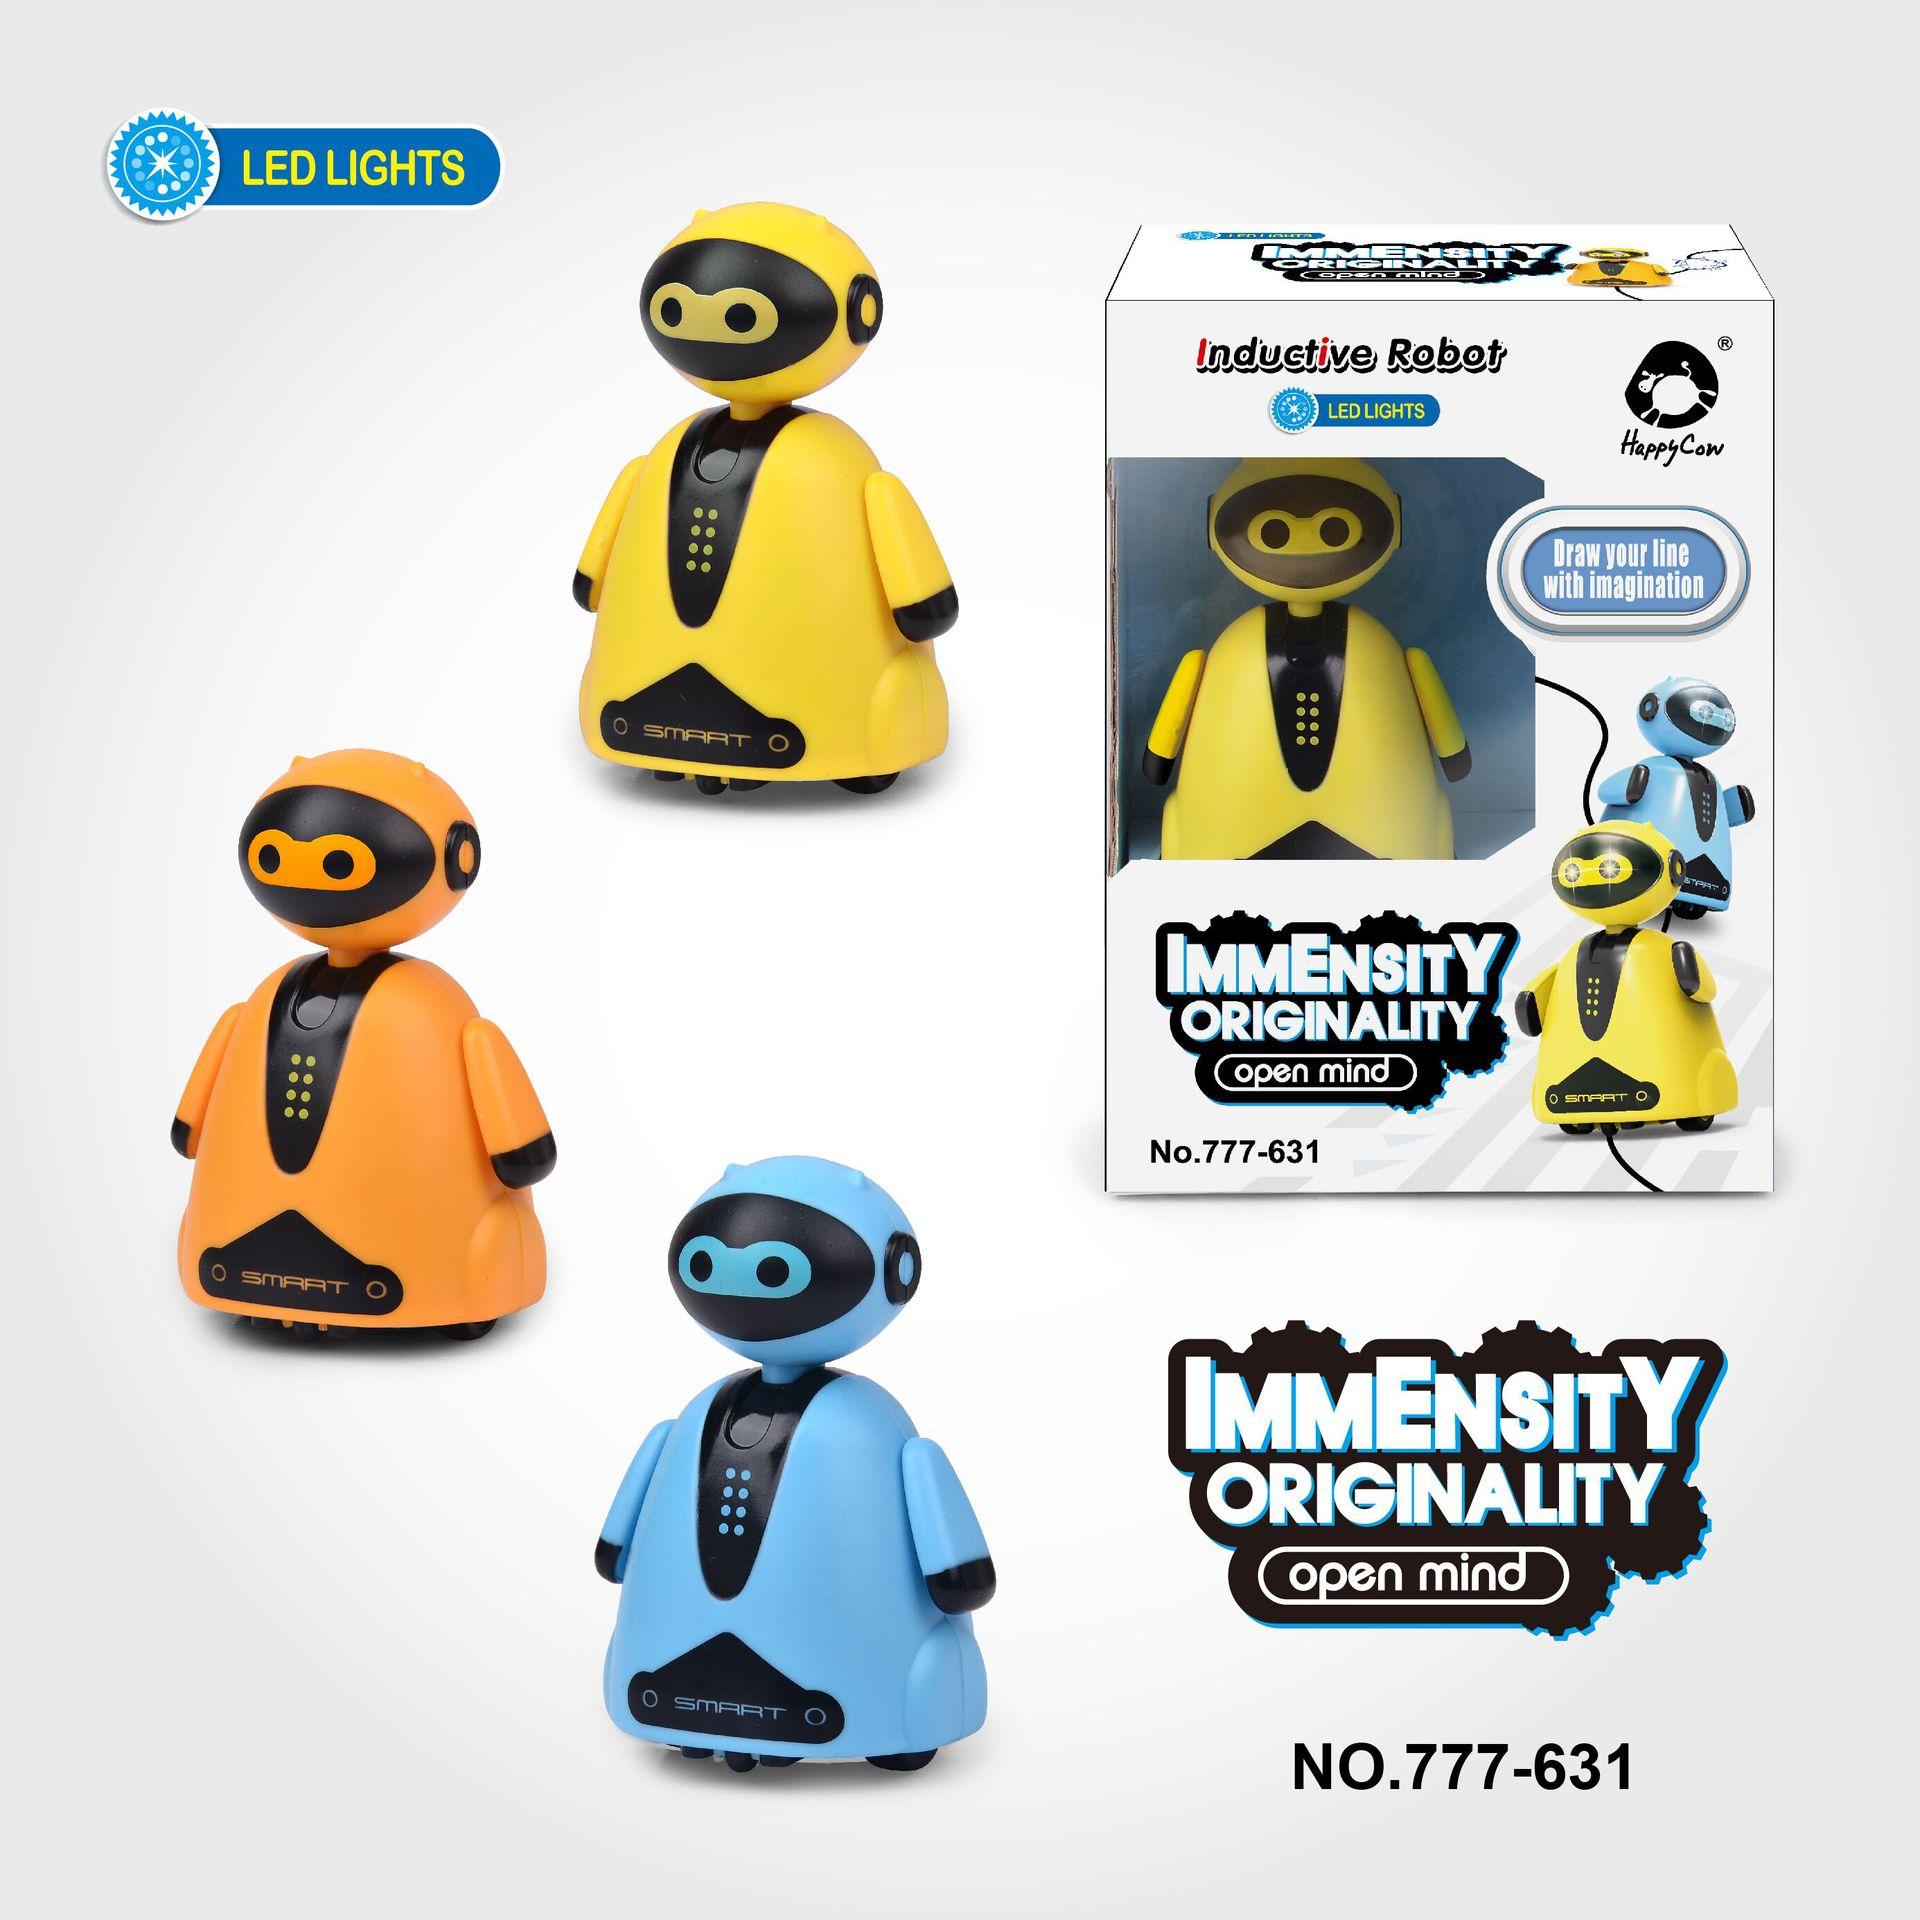 Tamagotchi Robot Tamagochi Inductive Penguin Pet With Led Lights Electric Follow Link To Walk Zuru Ksimerito Toys For Kids